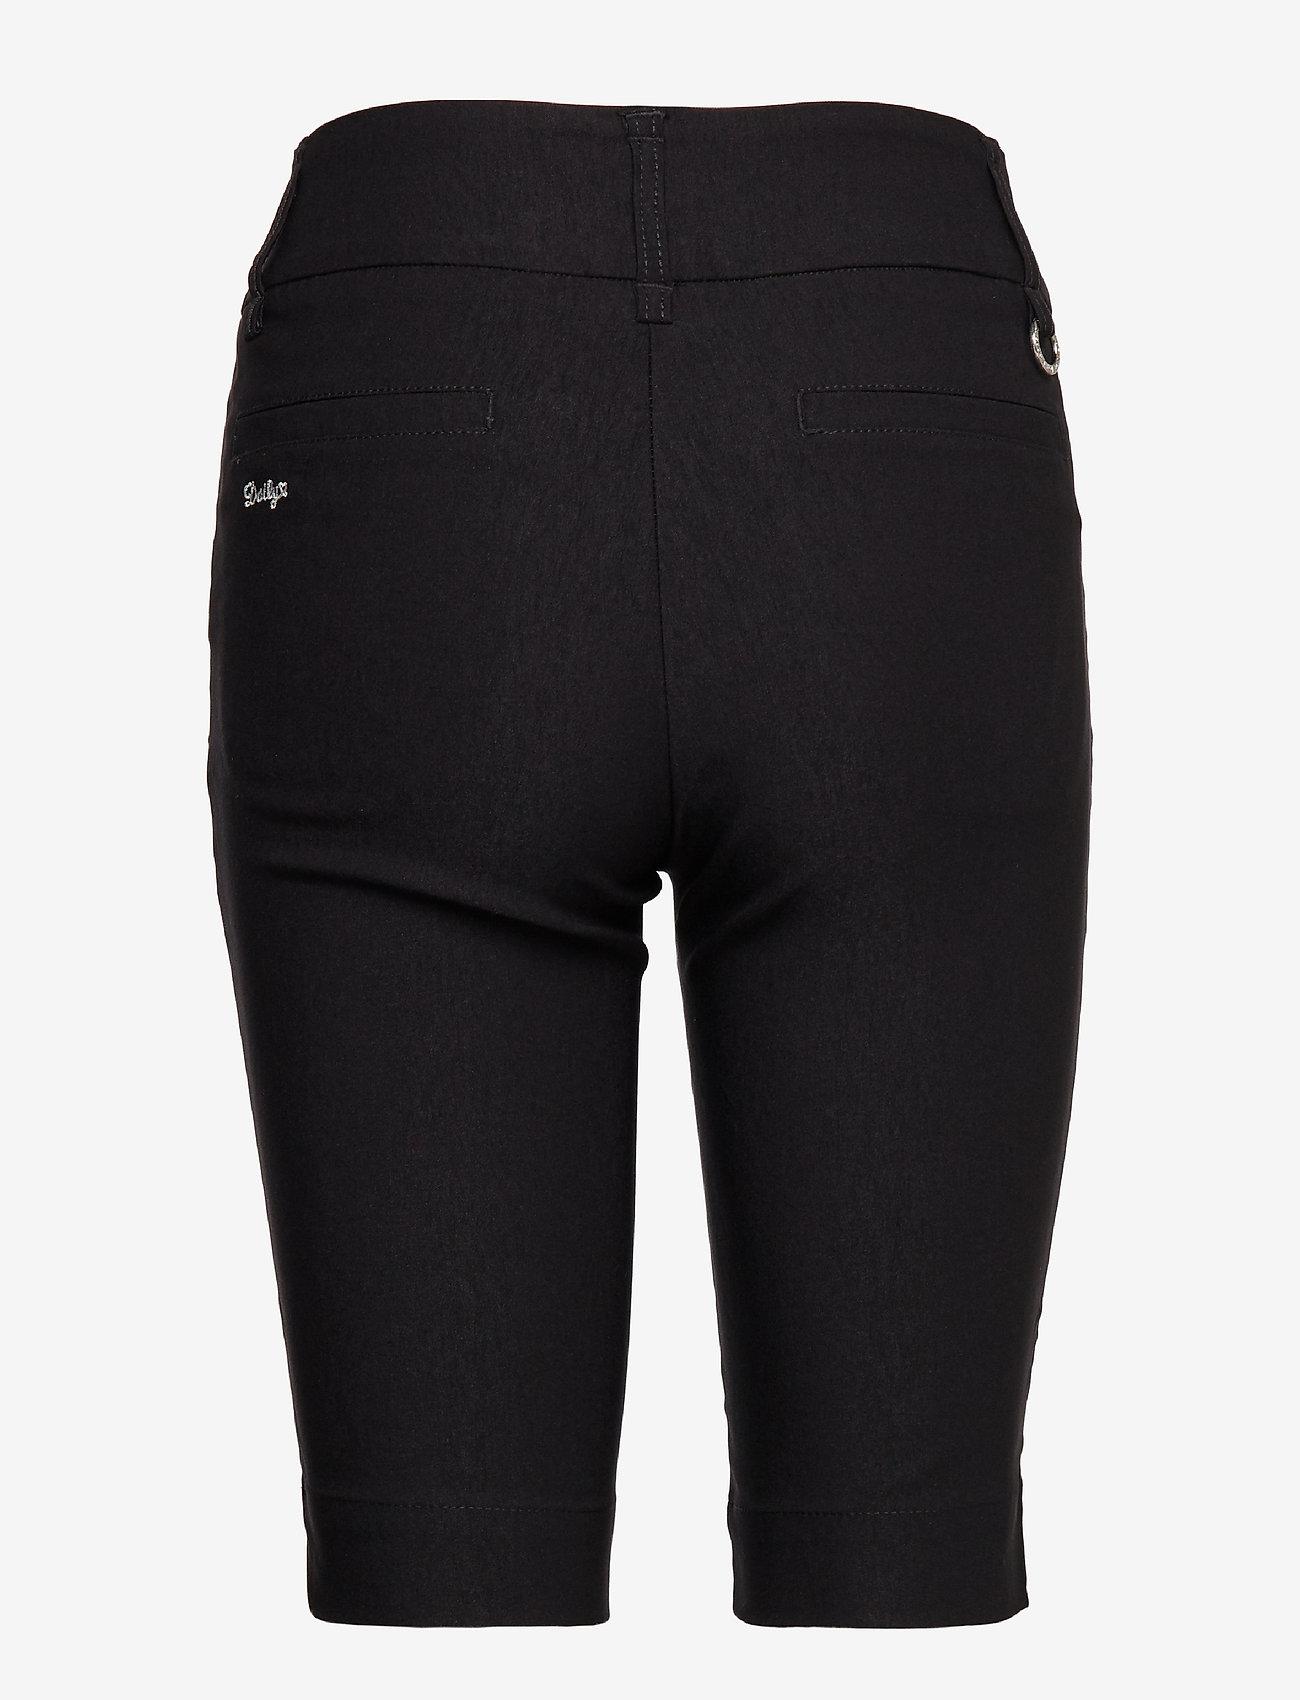 Daily Sports - Magic City Shorts 56 cm - golf shorts - black - 1